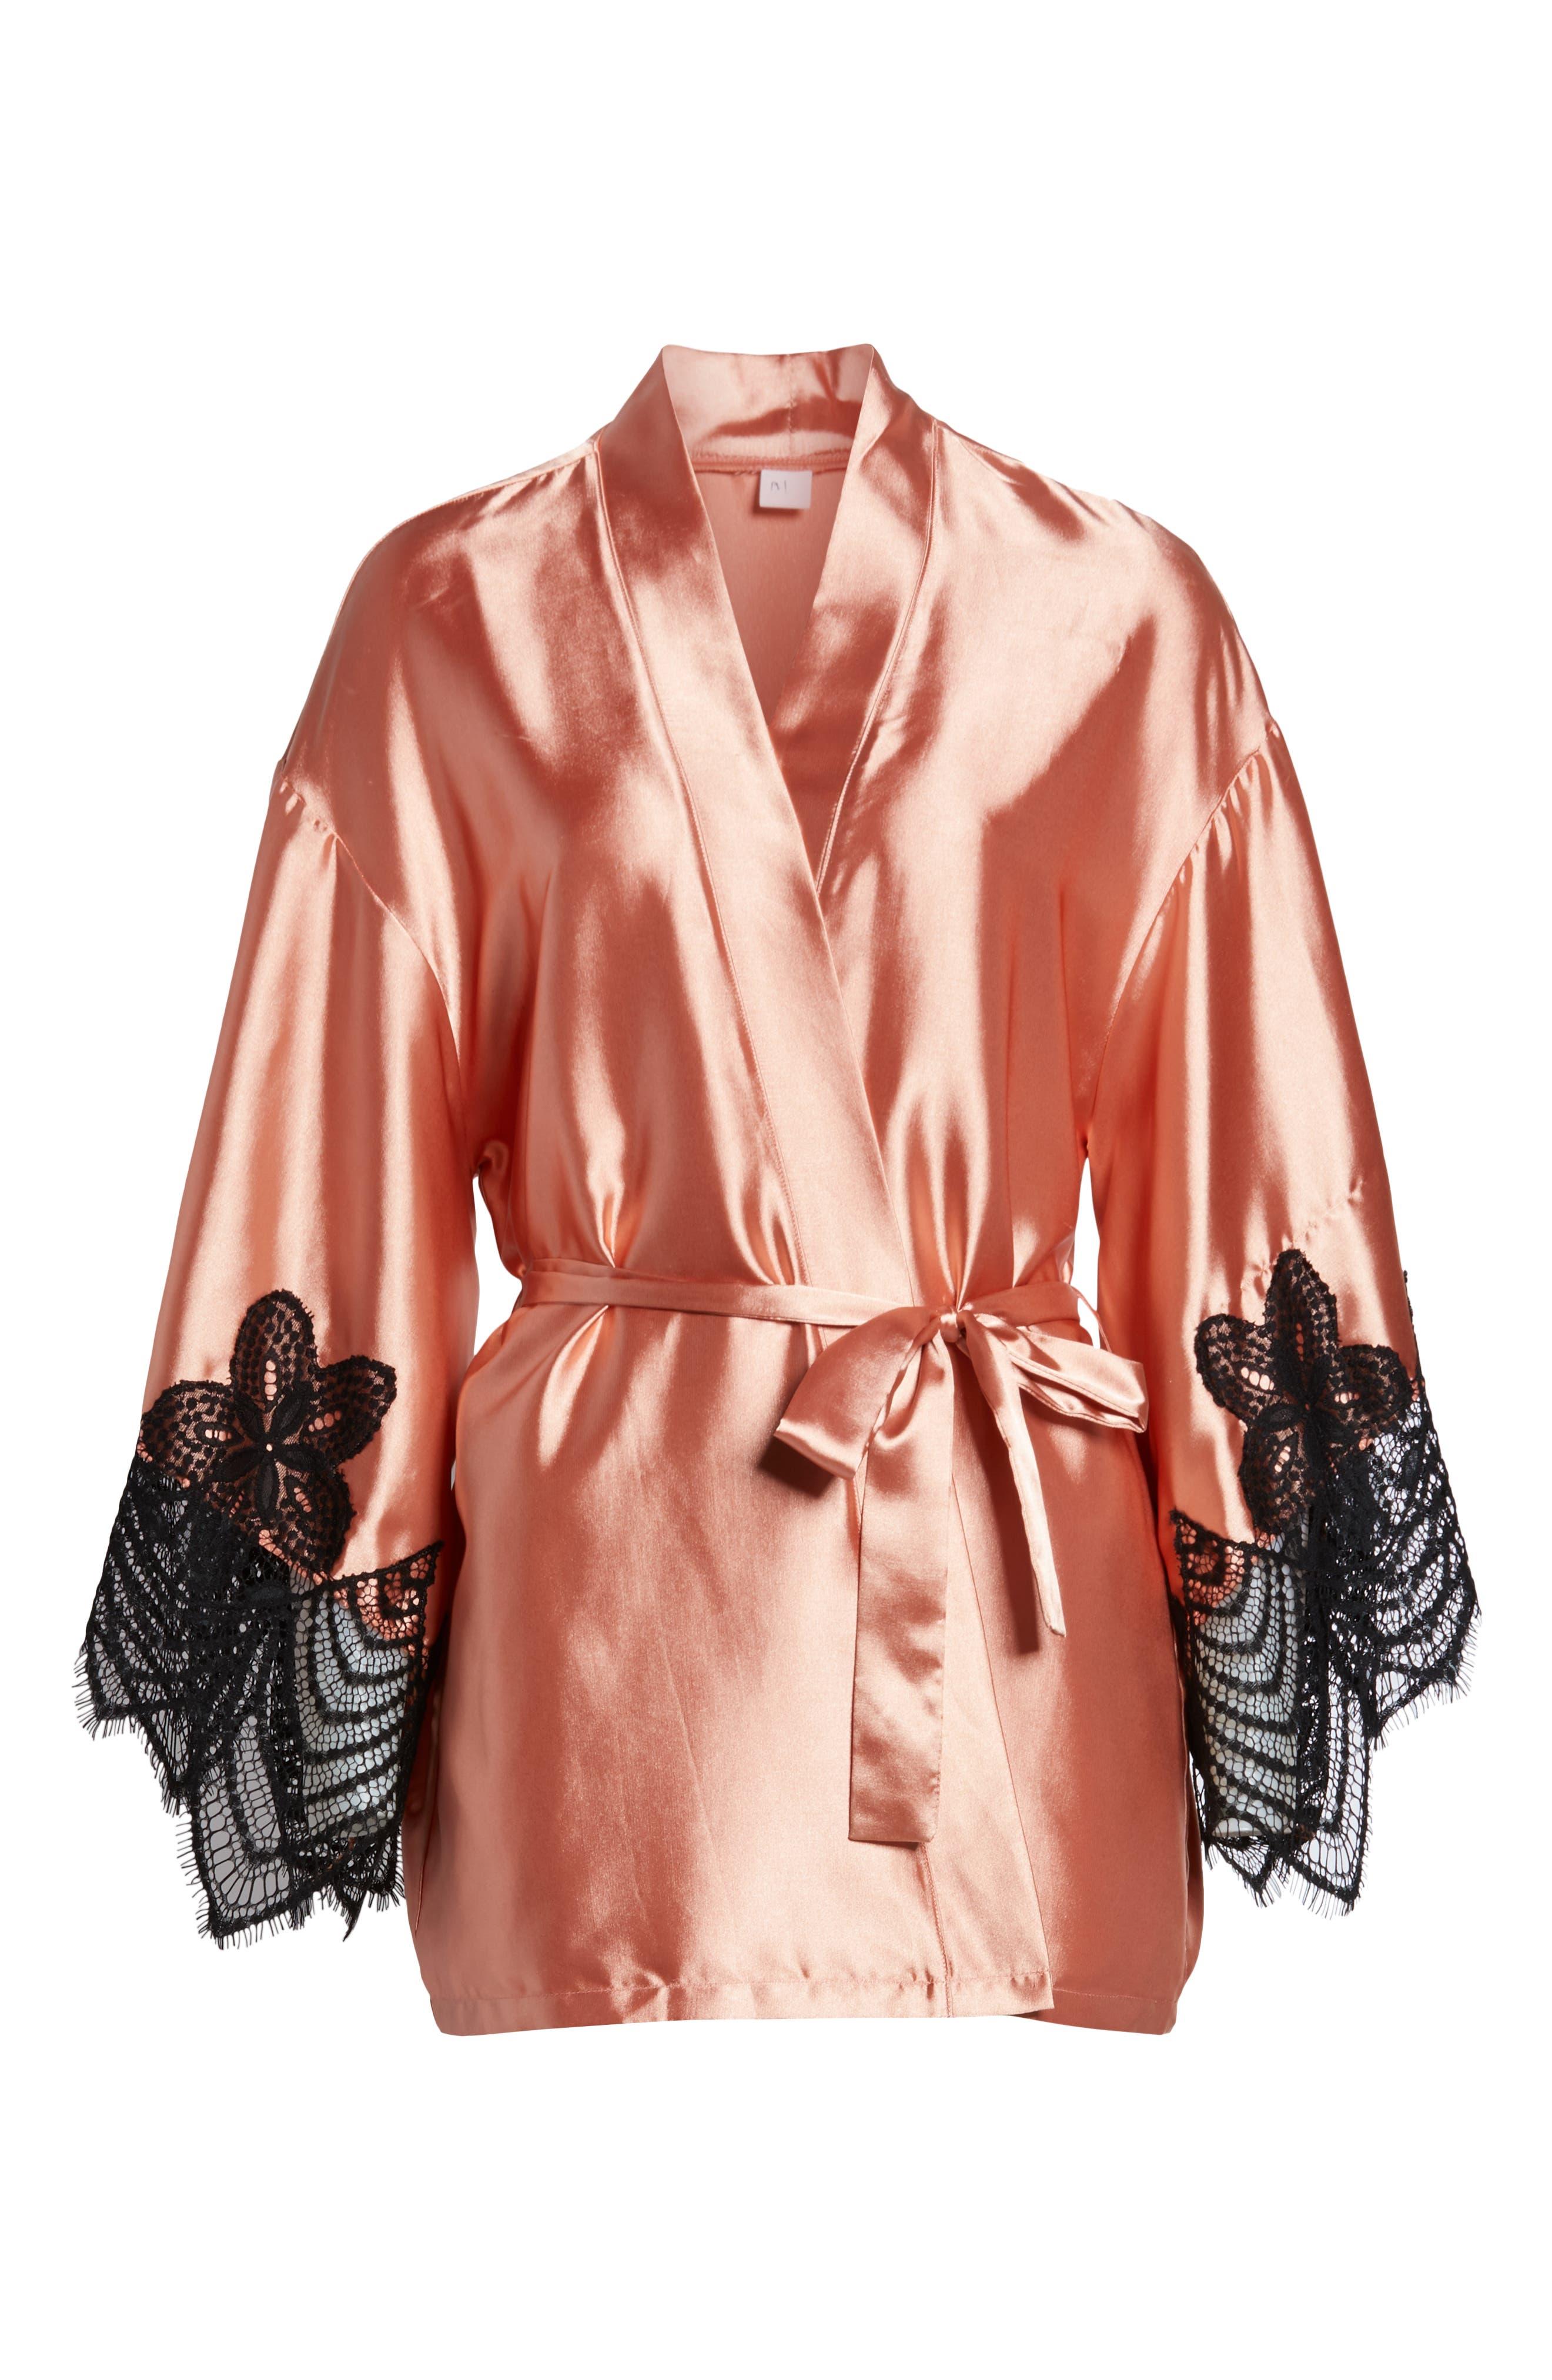 Drama Lace Trim Satin Robe,                             Alternate thumbnail 6, color,                             CAMEO BROWN/ BLACK